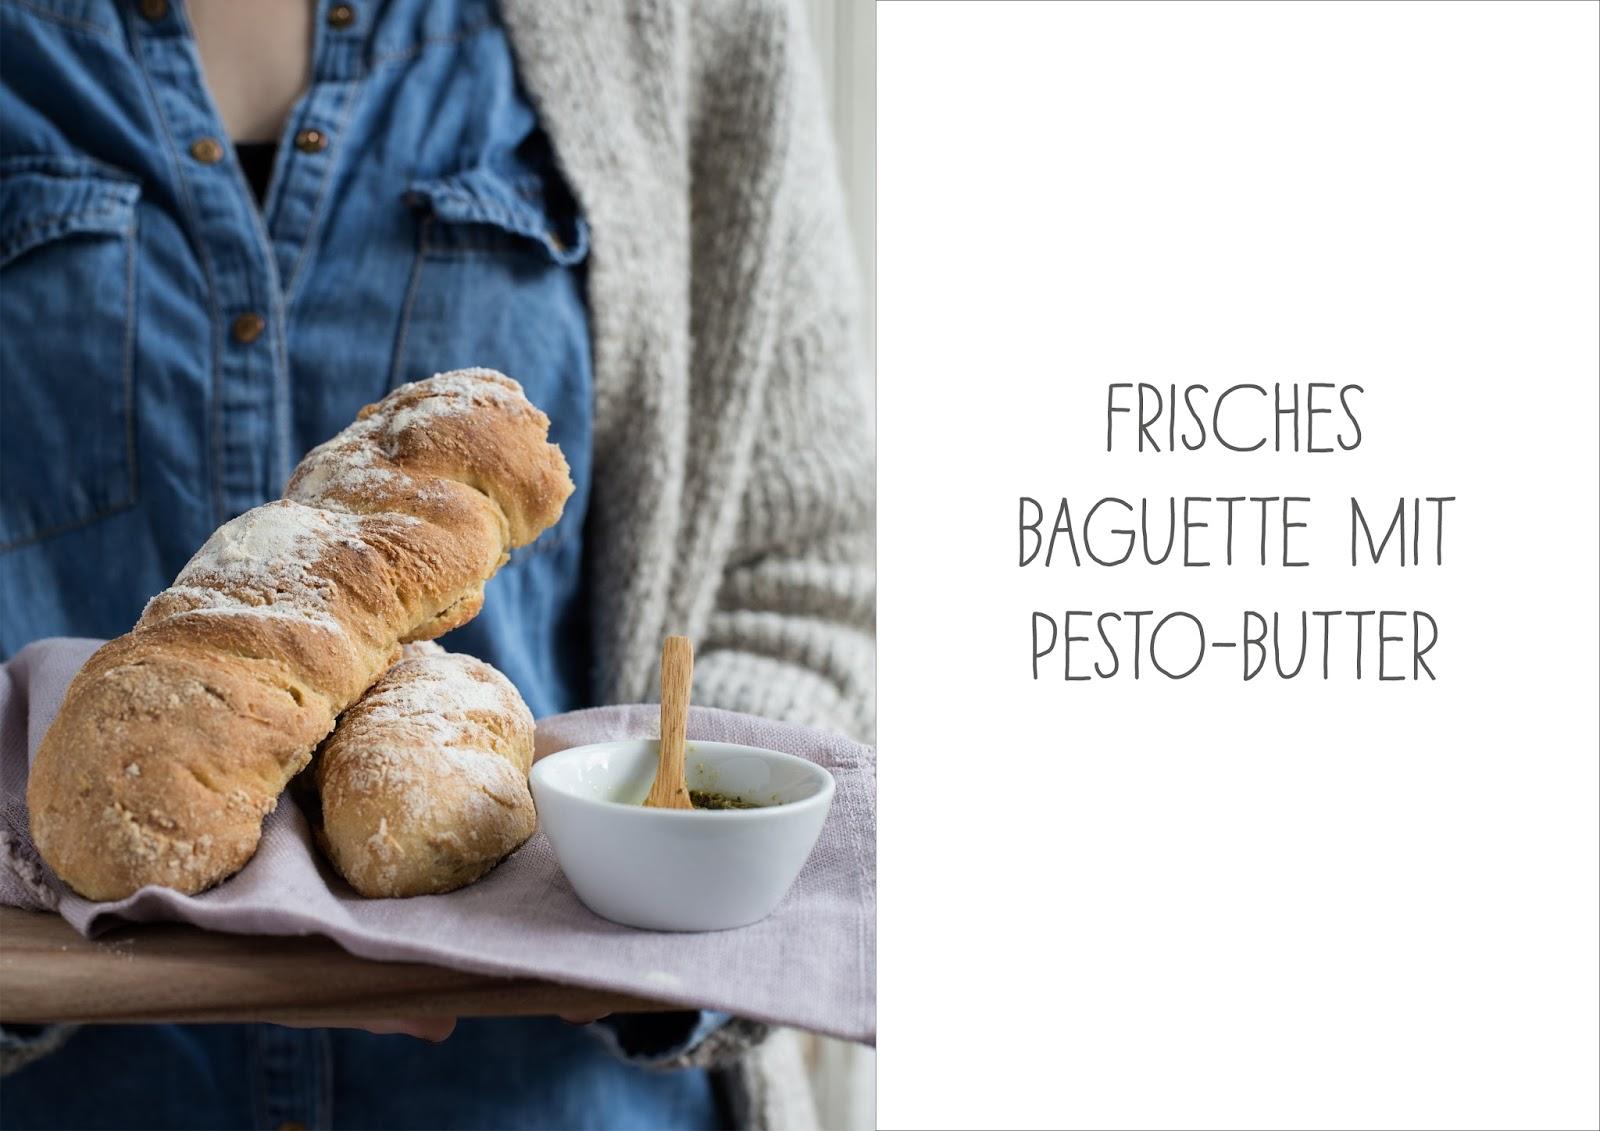 Frisches Baguette mit Pestobutter